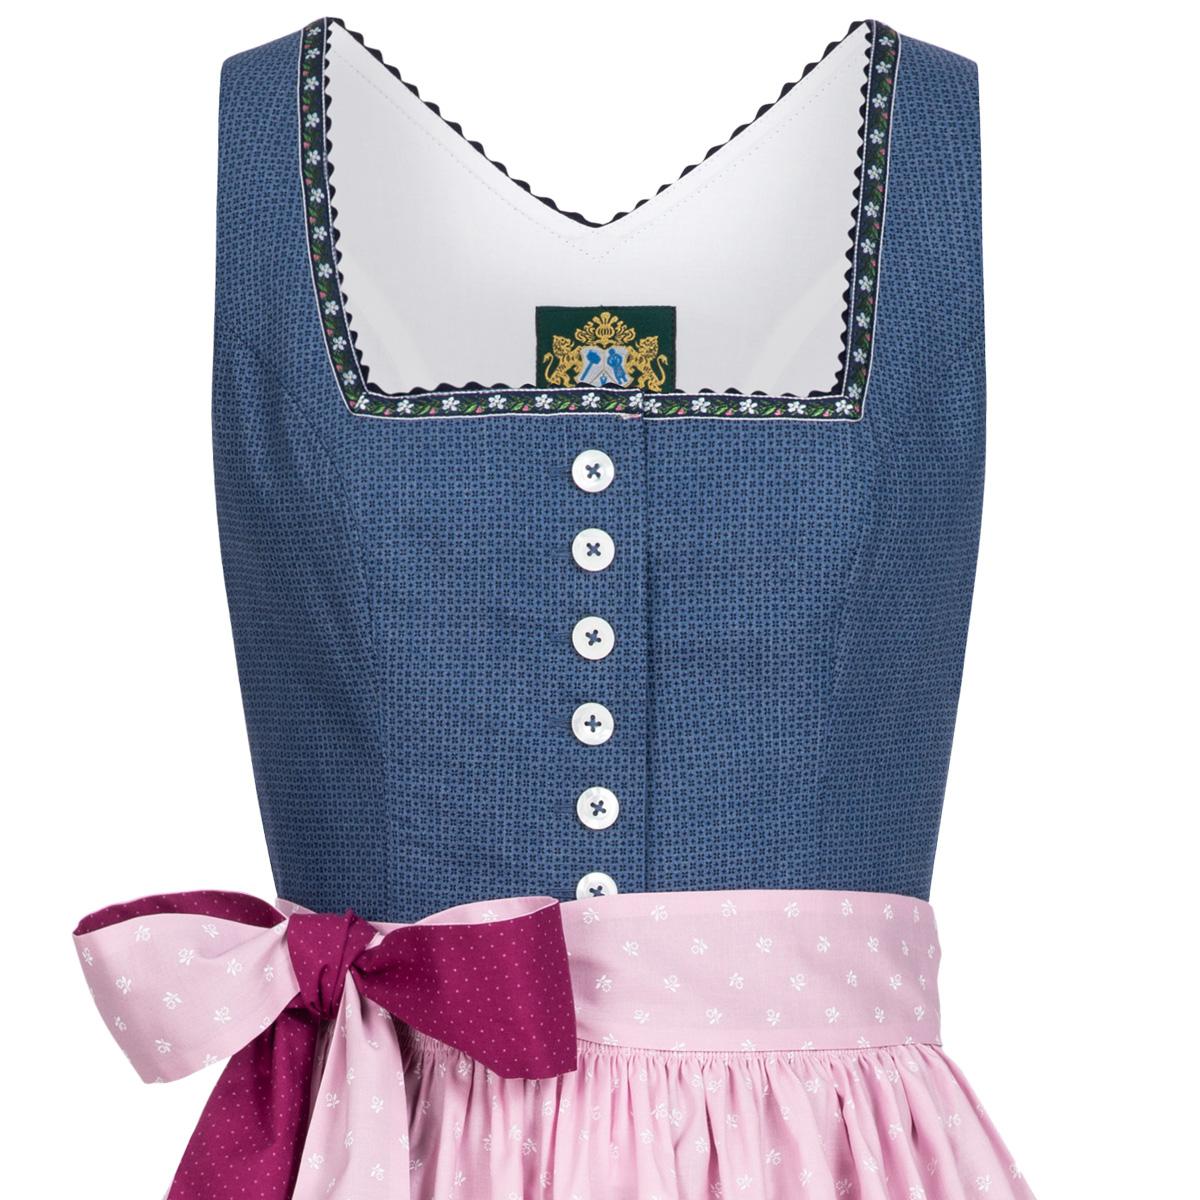 2ca78e06d8a7e2 Trachten Traditionelle Bekleidung Hammerschmid Damen Trachten-Mode Midi  Dirndl Thiersee in Blau traditionell